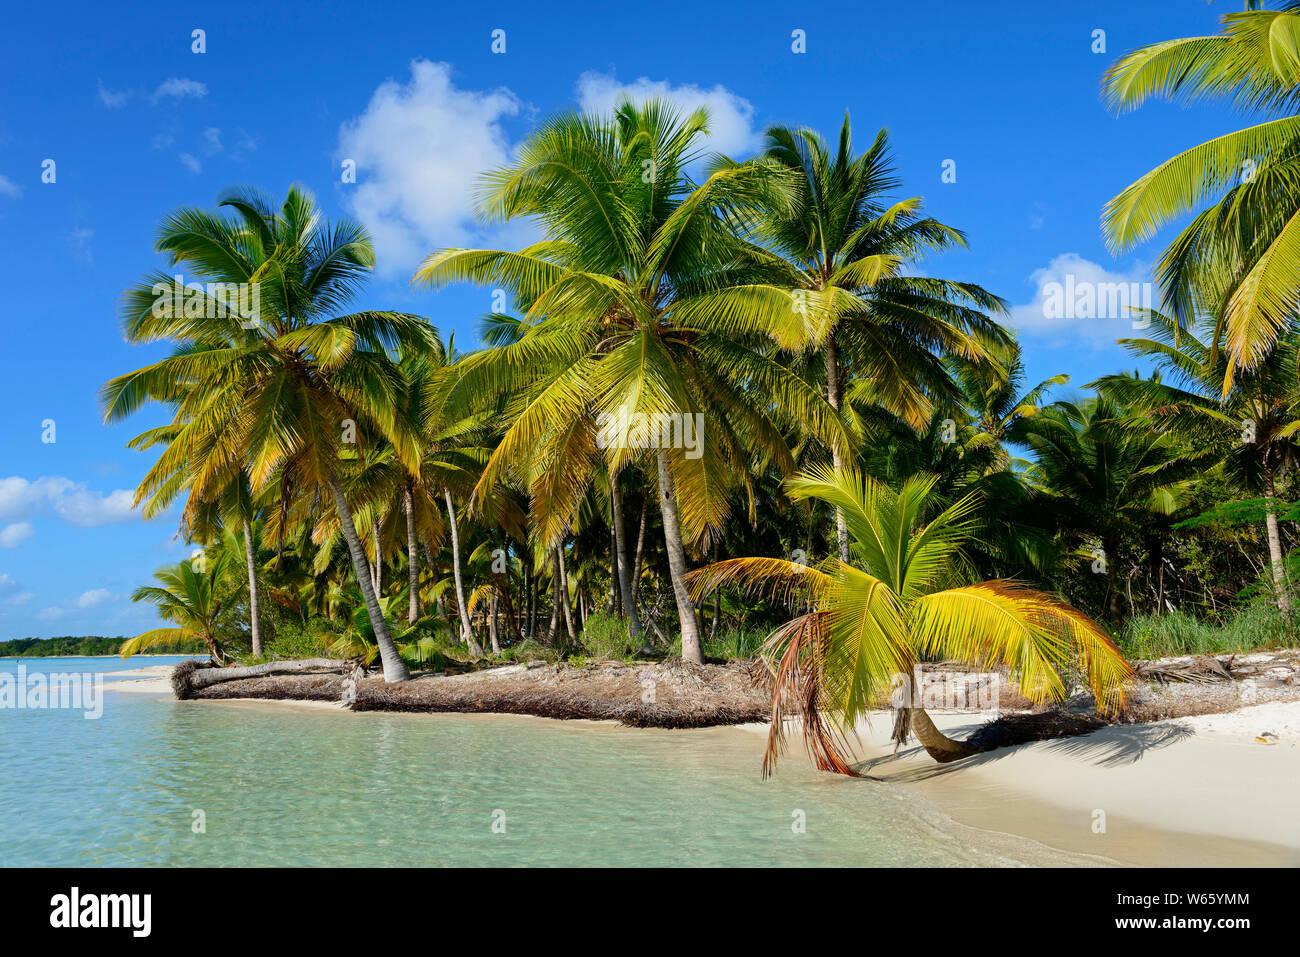 Palm beach, Parque Nacional del Este, Dominican Republic, Carribean, America Stock Photo